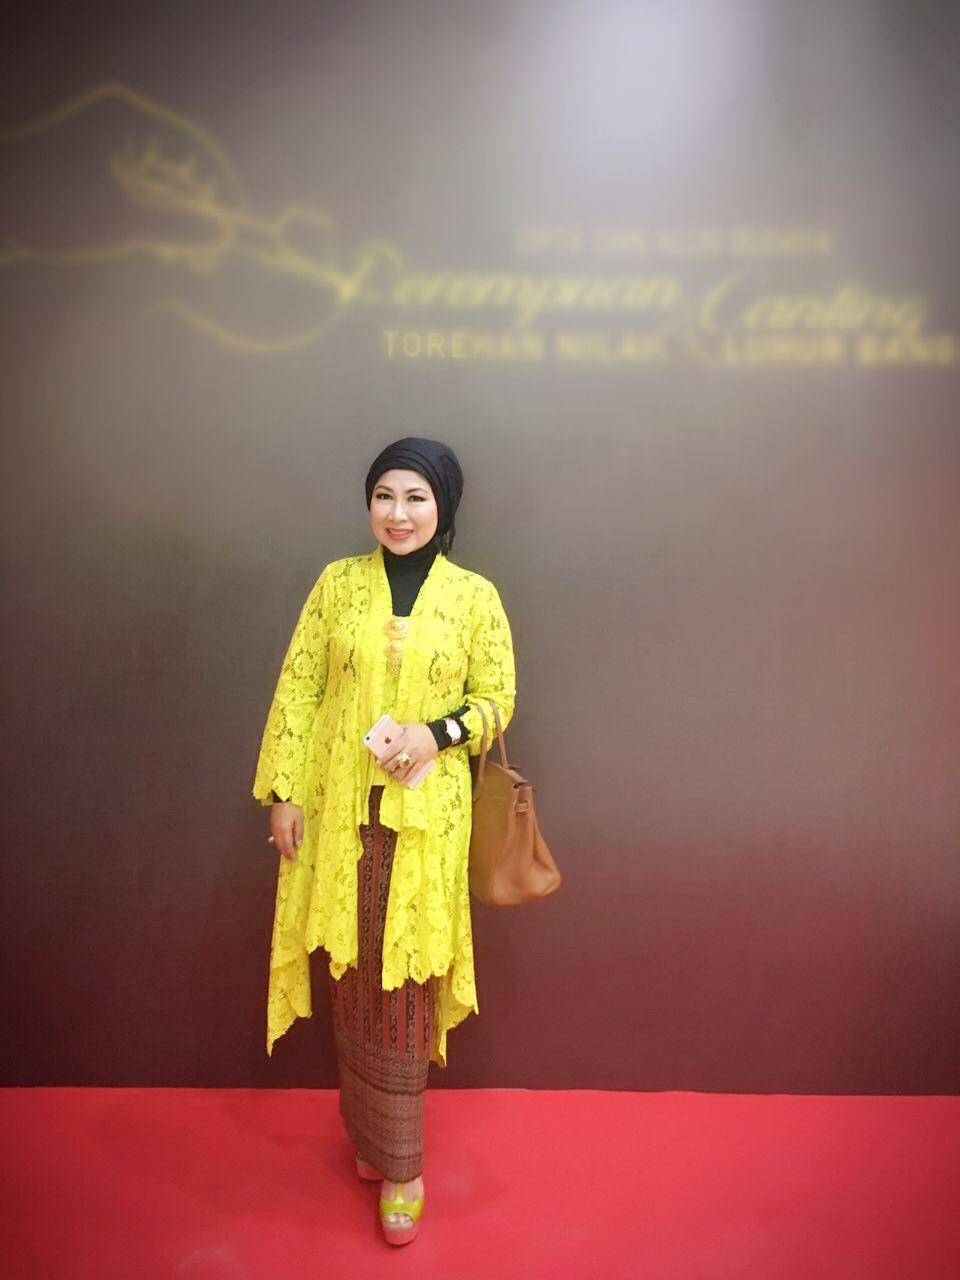 Kebaya Salah Satu Baju Nasional Indonesia Yg Ku Suka Kebaya Kuning